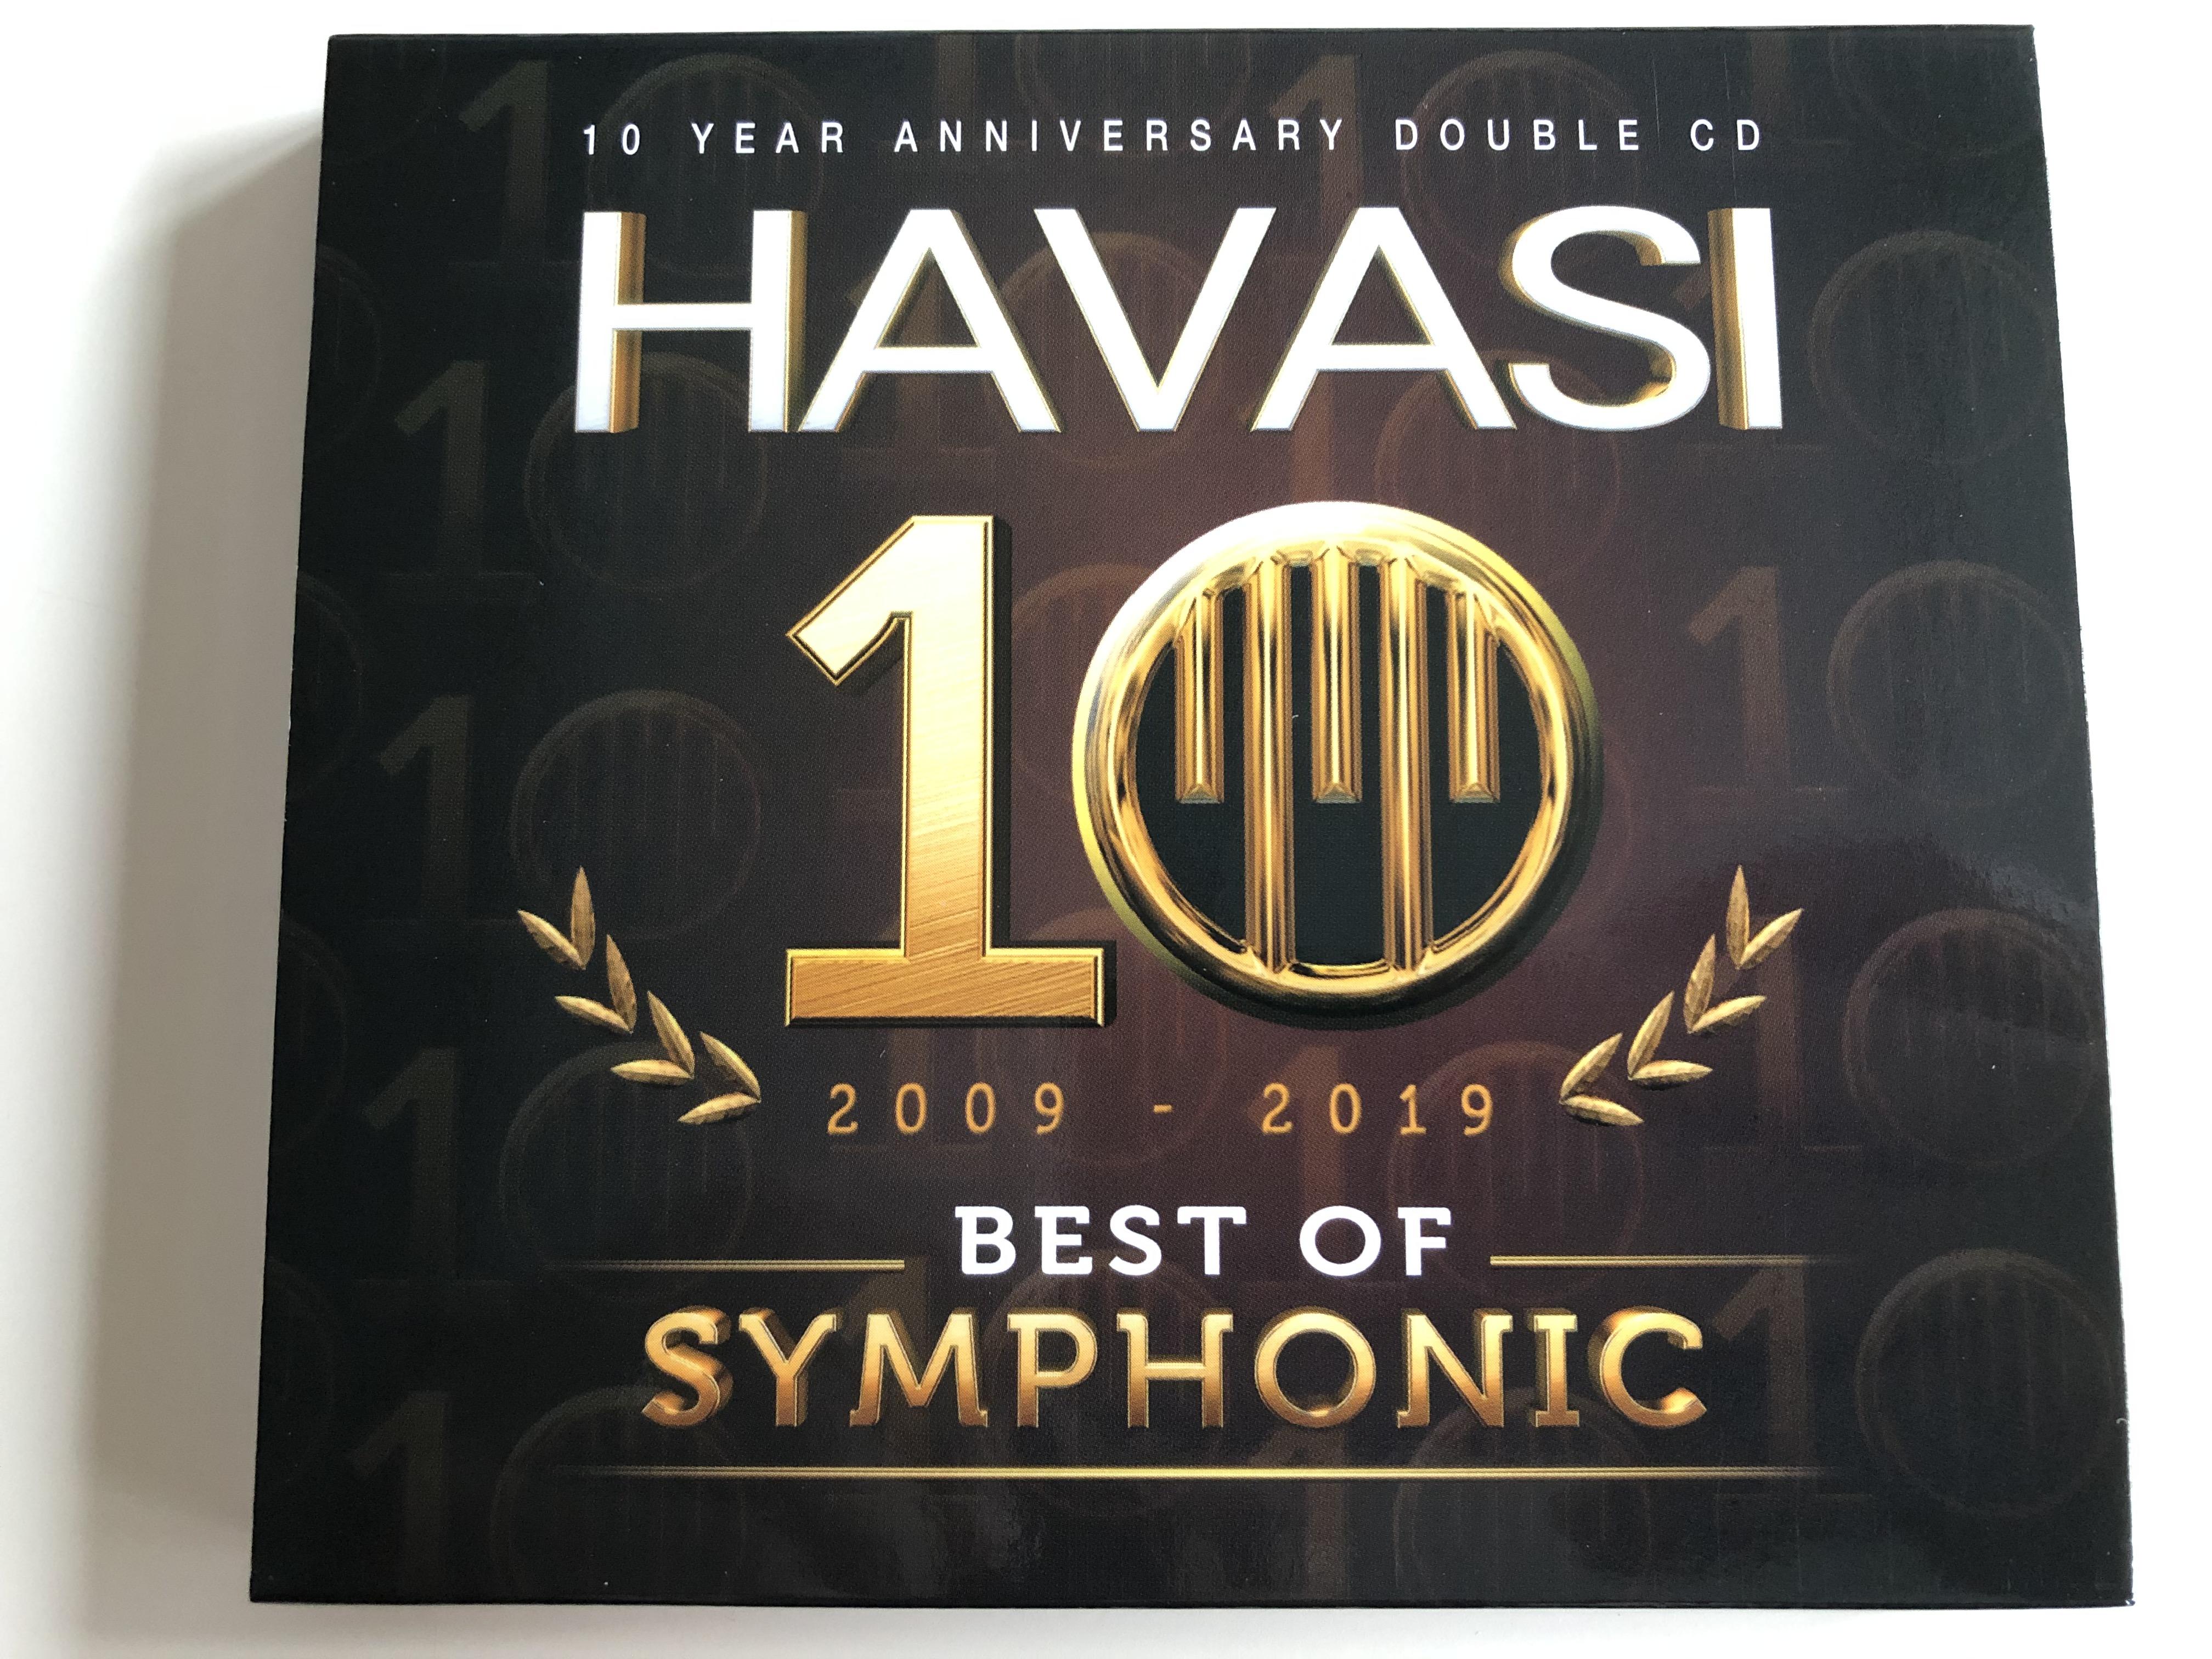 10-havasi-havasi-bal-zs-10-year-anniversary-2009-2019-best-of-symphonic-2cd-collector-s-edition-1-.jpg